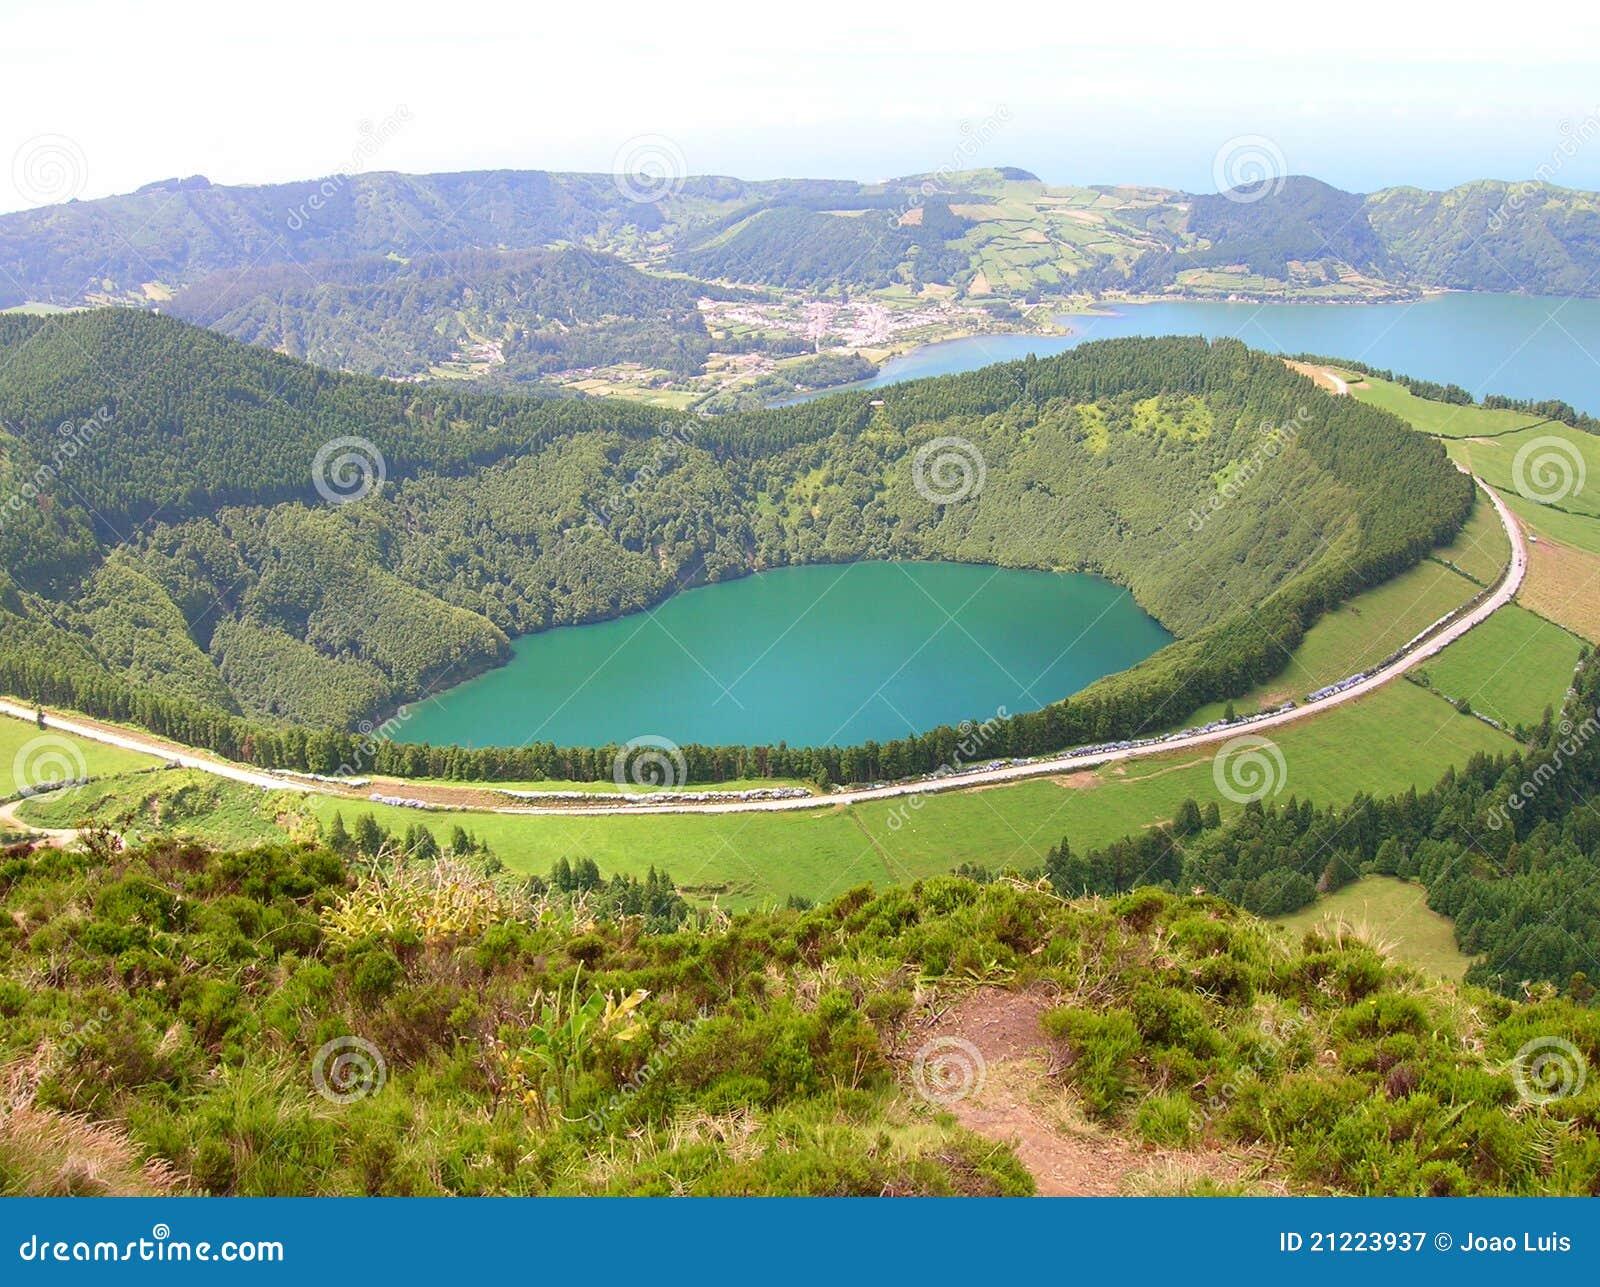 Volcanic caldera stock image. Image of scenic, seaside ...